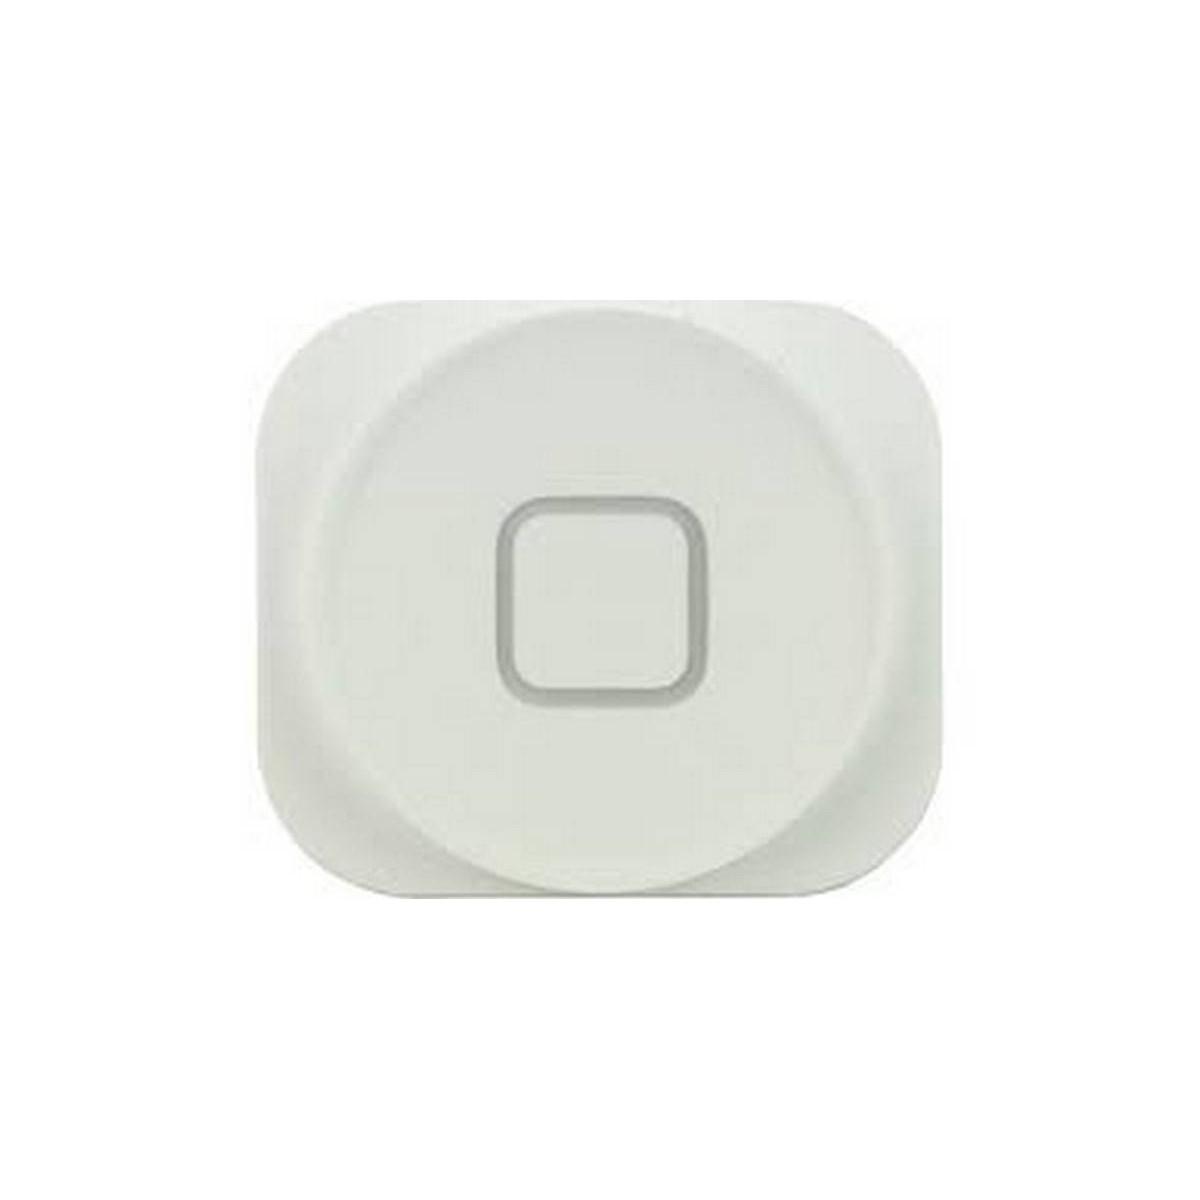 Boton home blanco para iPhone 5c